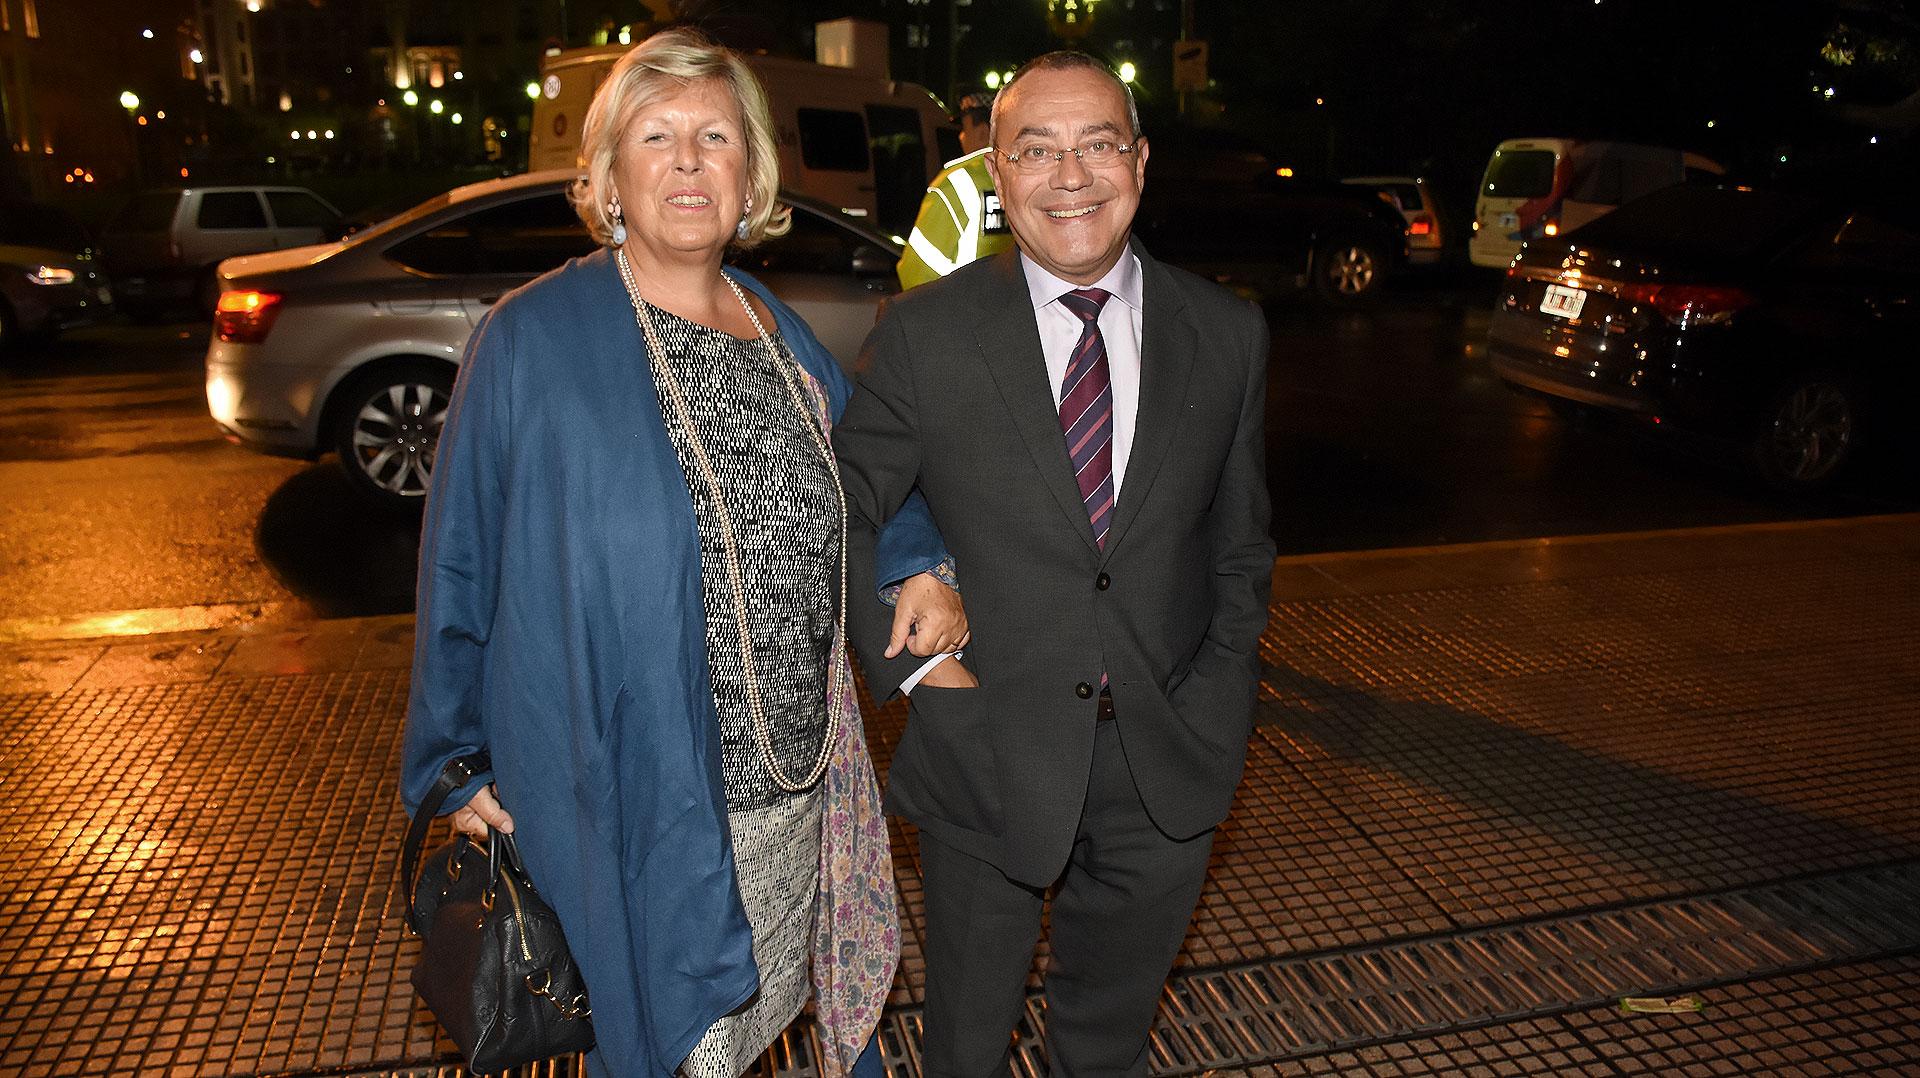 El embajador de Francia en la Argentina, Jean-Michel Casa